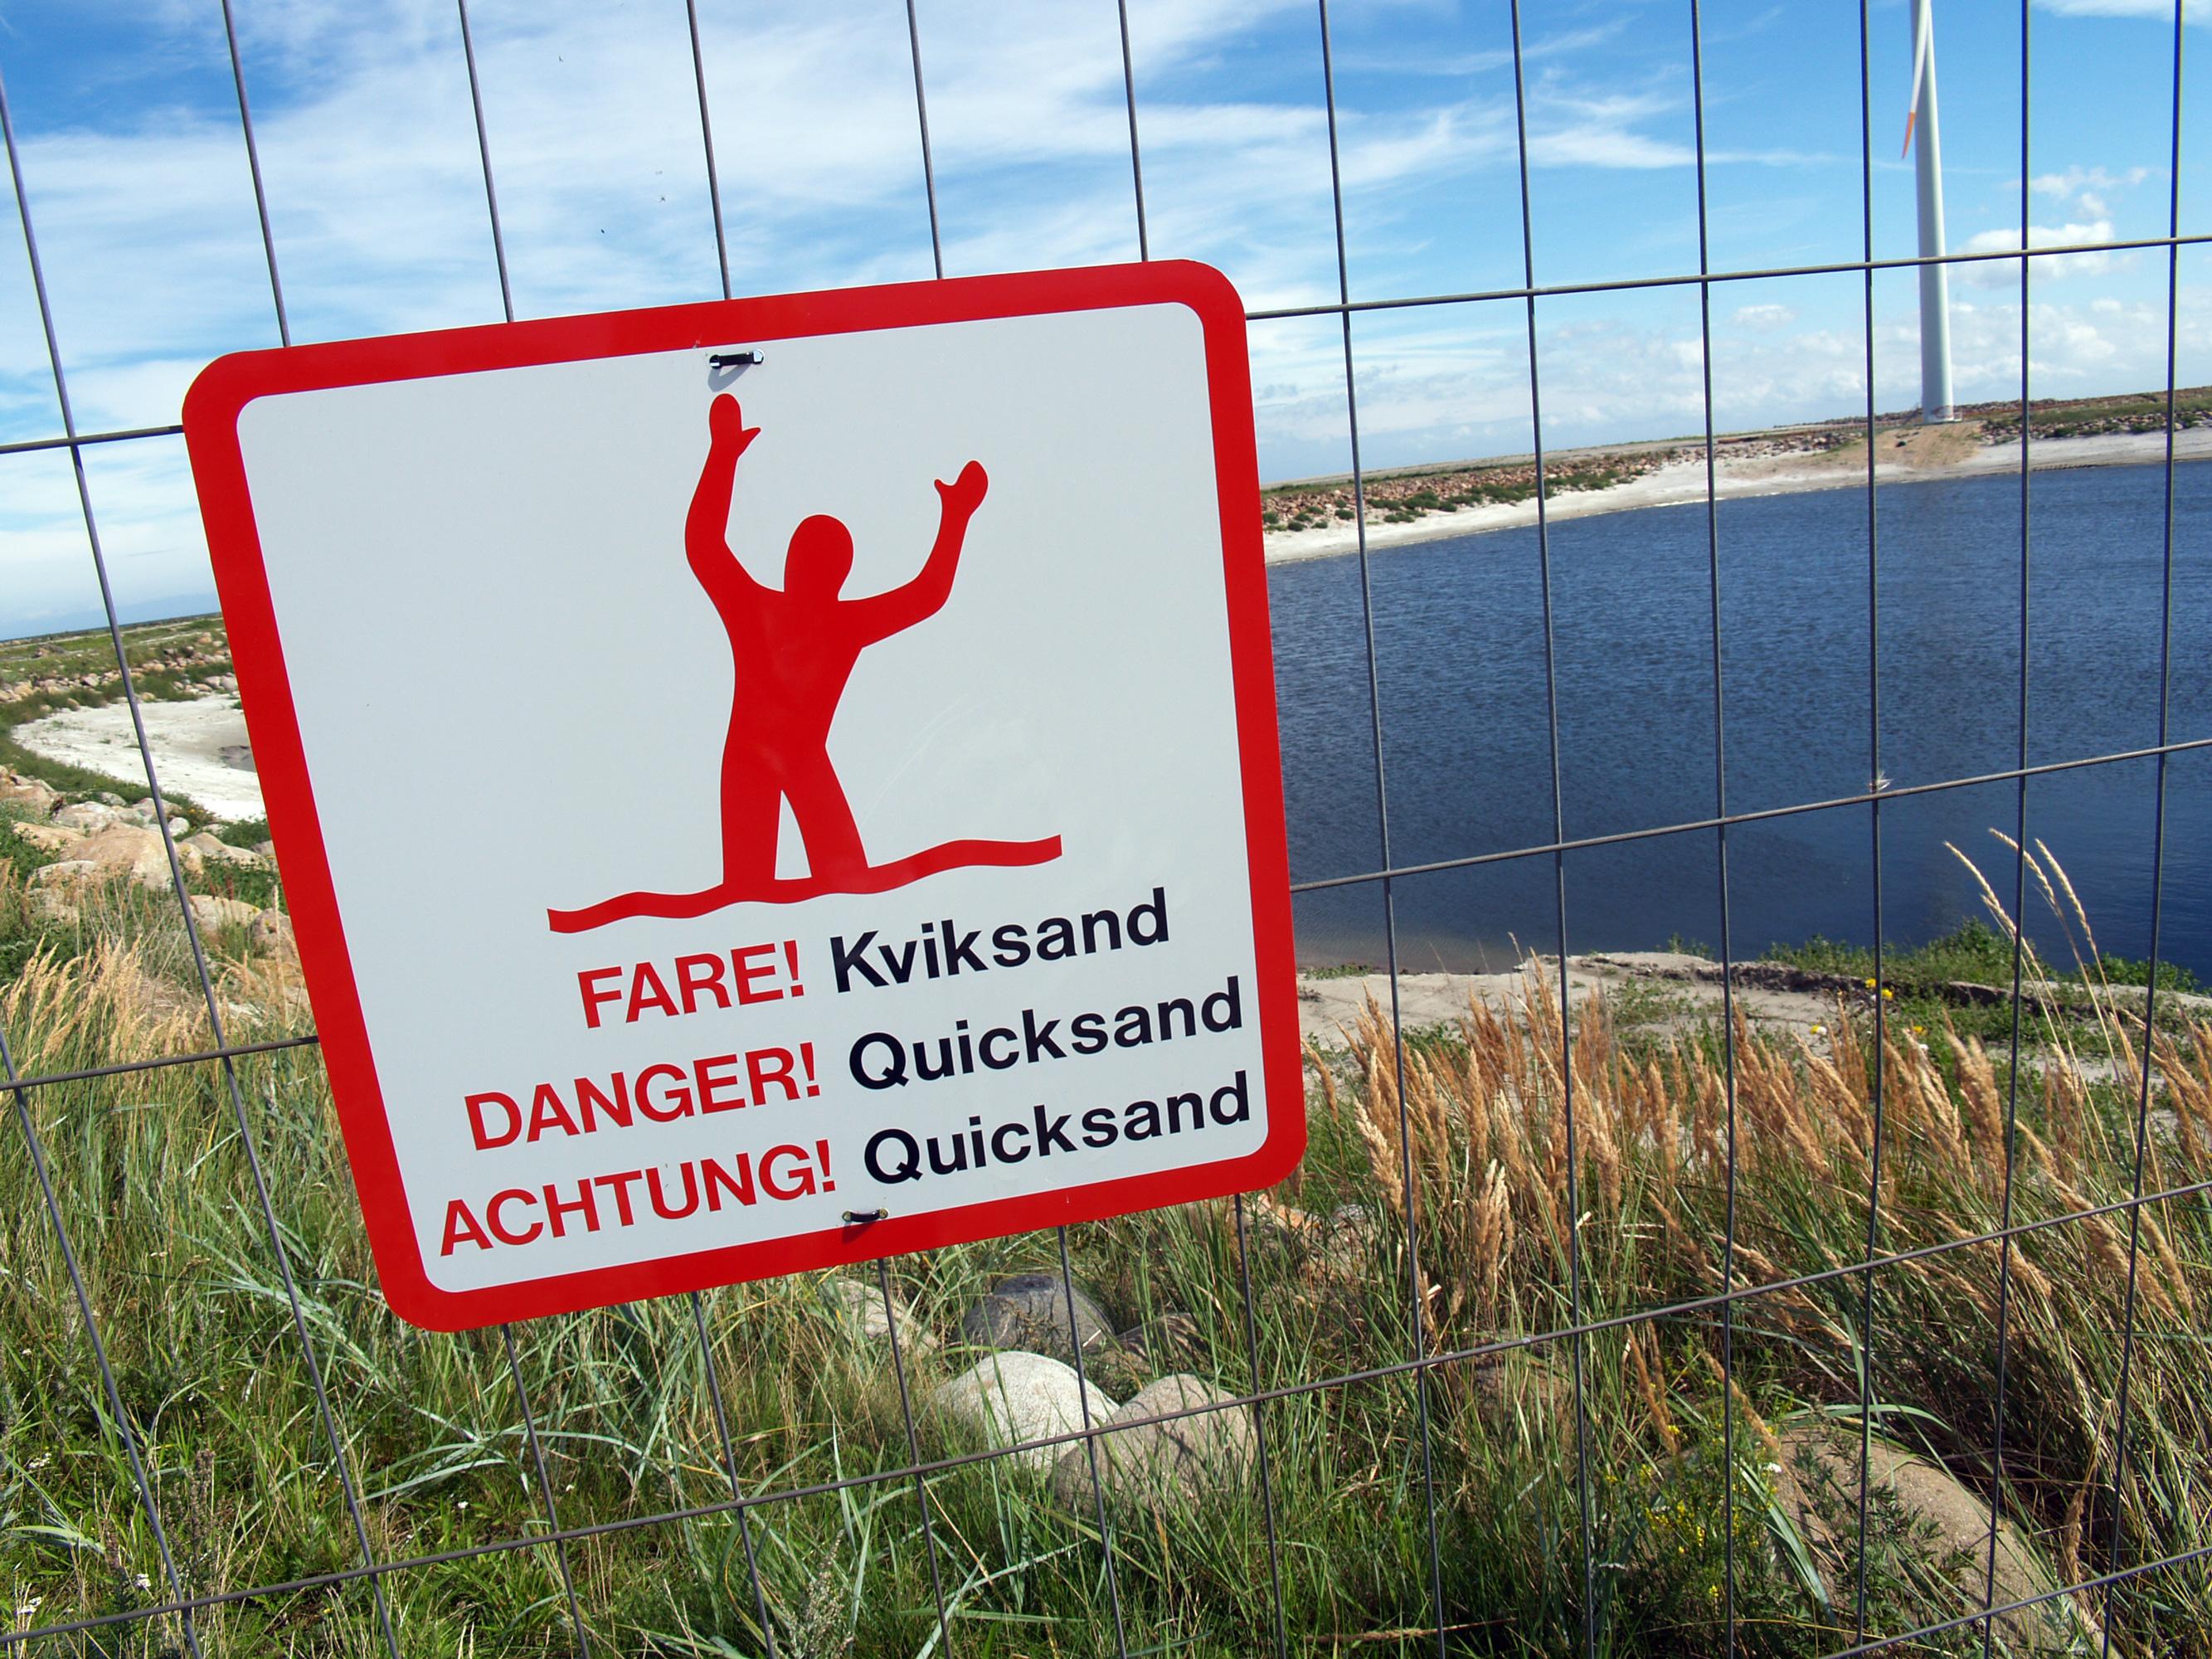 Danger! Quicksand